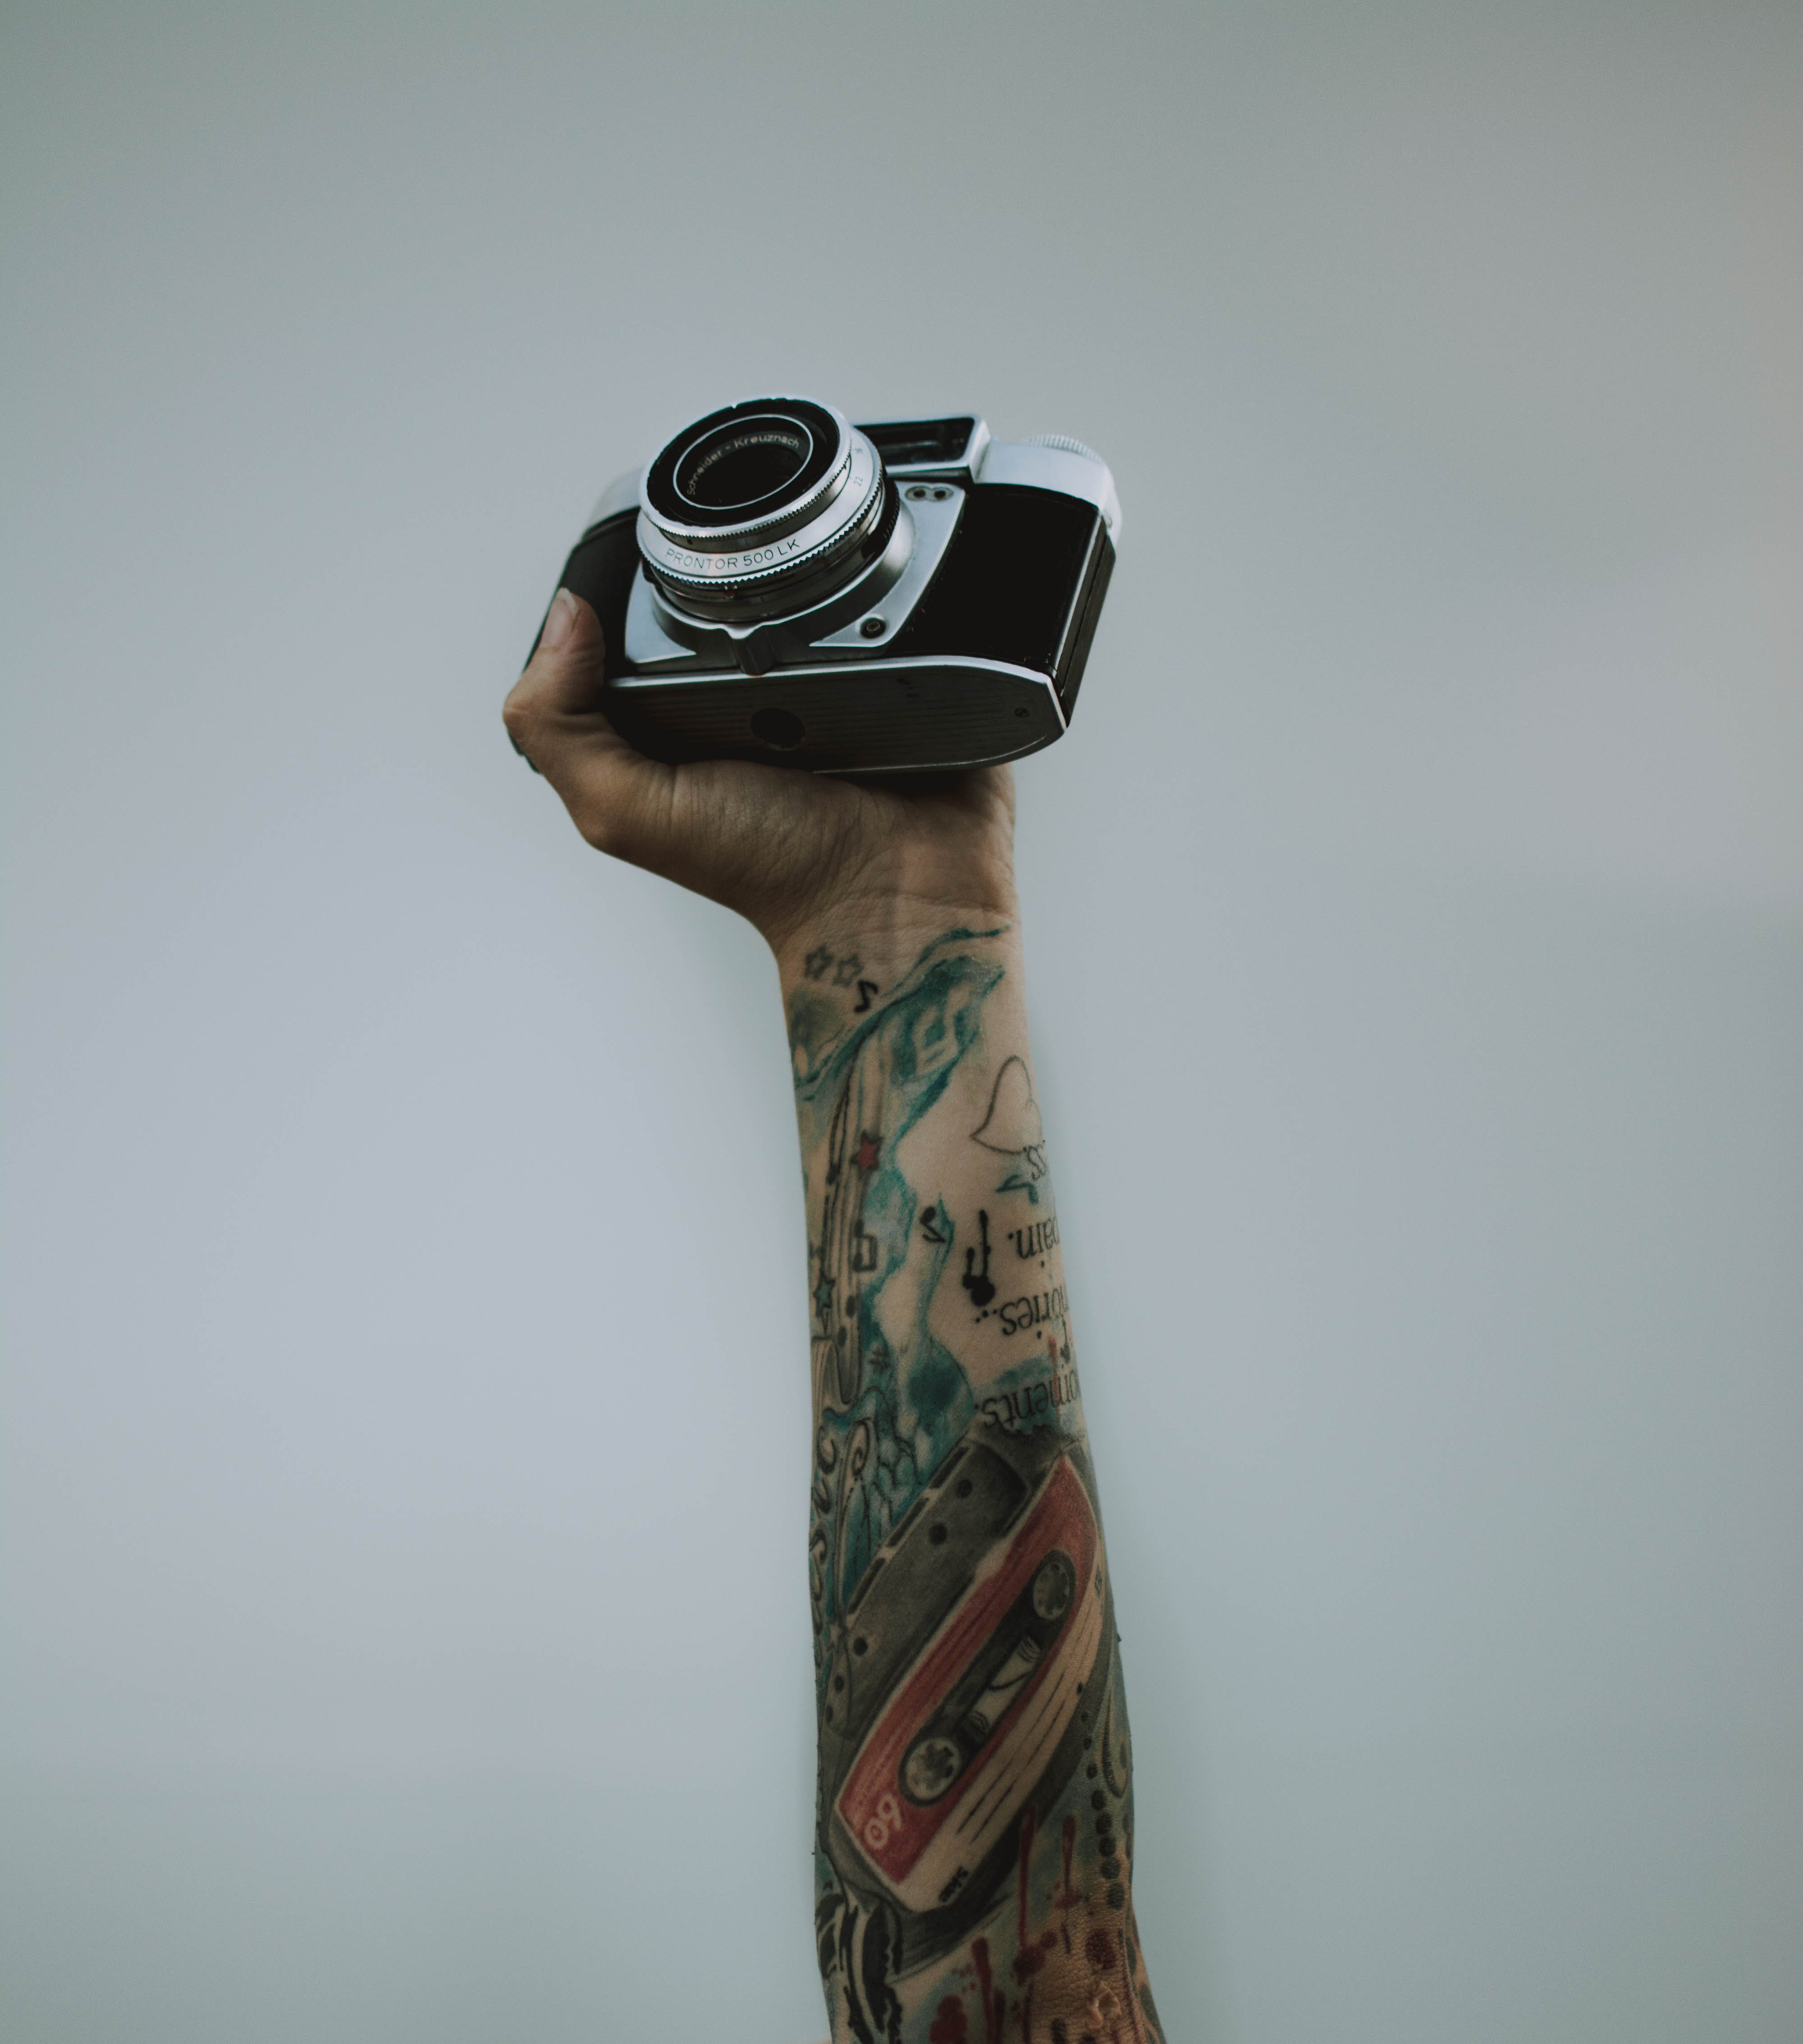 Person Holding Slr Camera